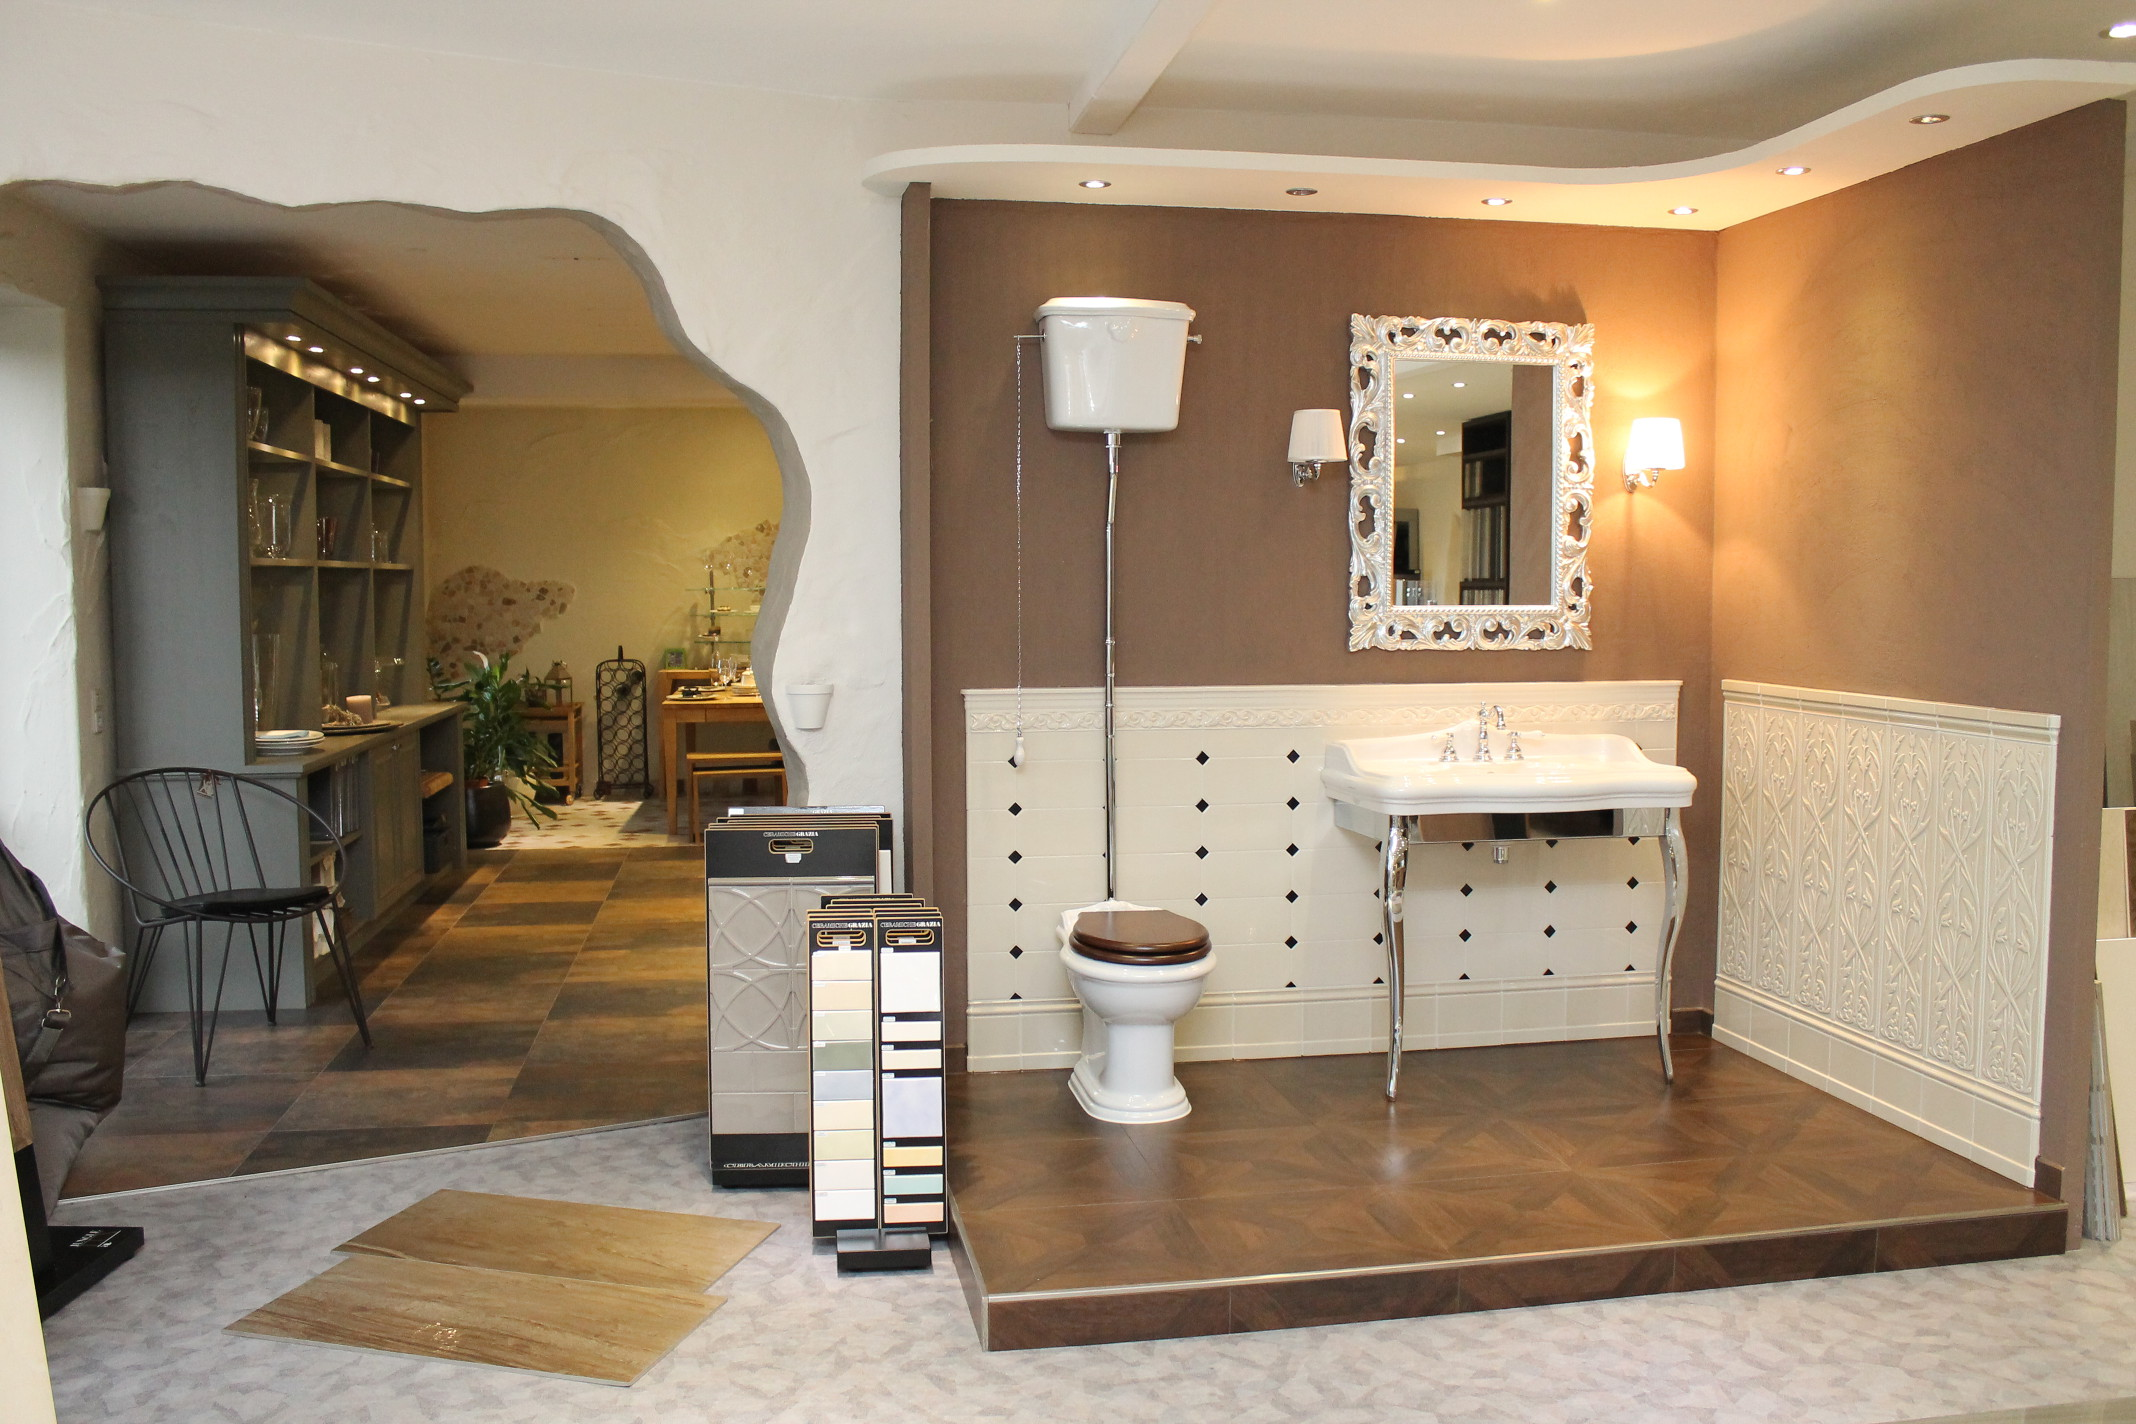 fliesenparadies thies. Black Bedroom Furniture Sets. Home Design Ideas